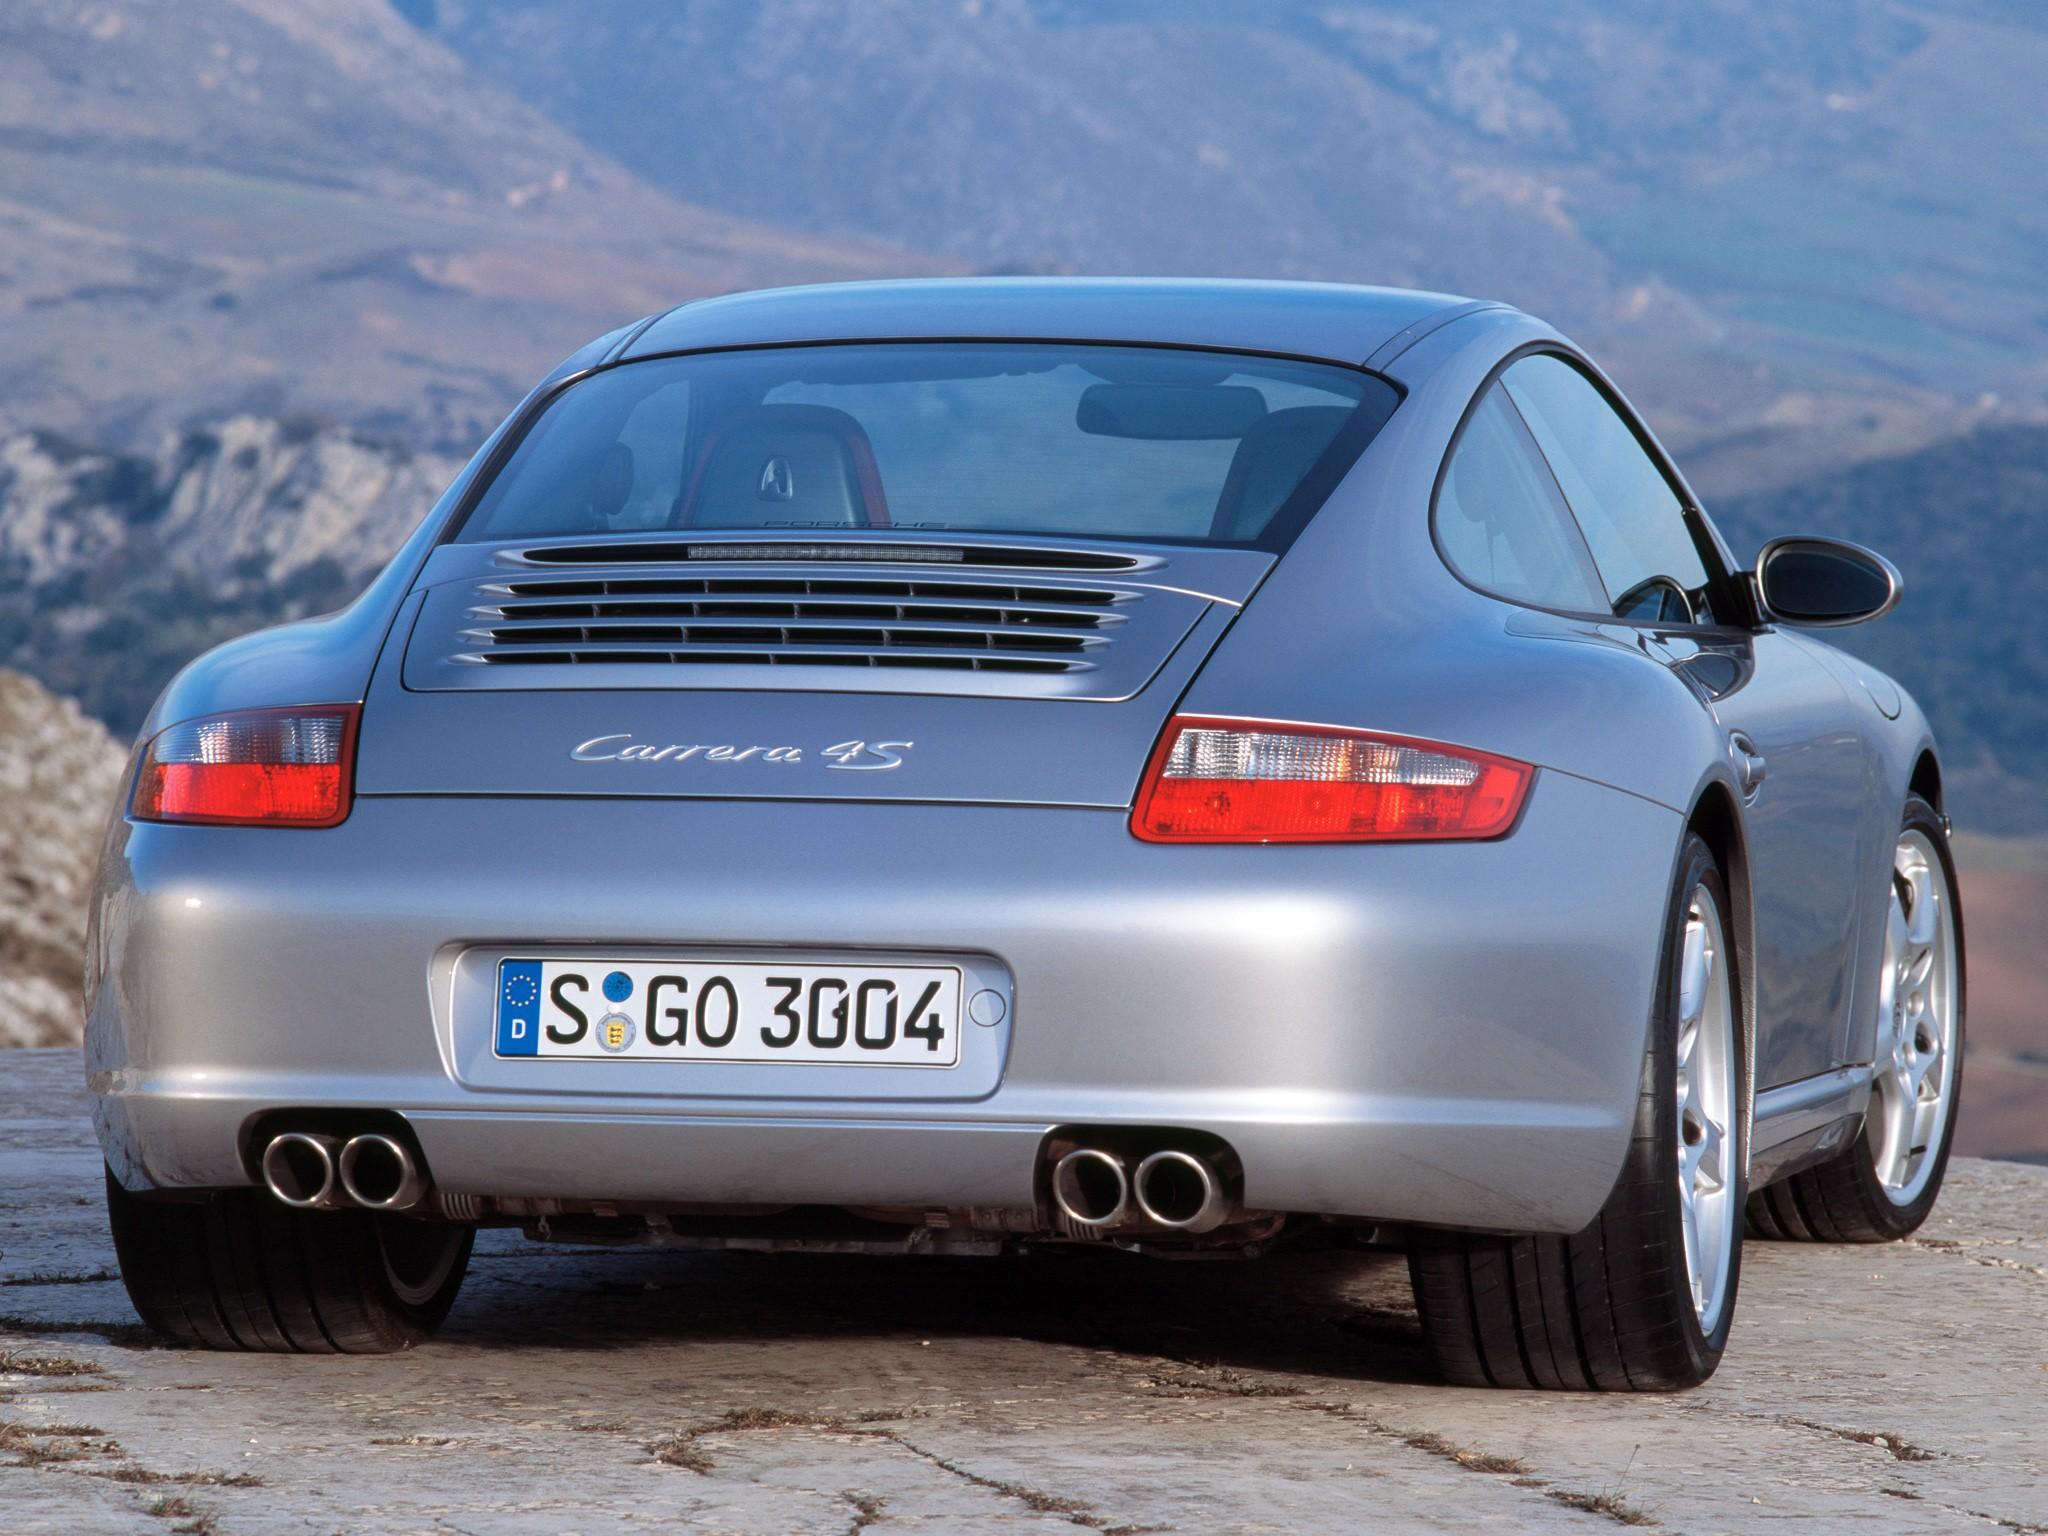 Porsche carrera 4s photo